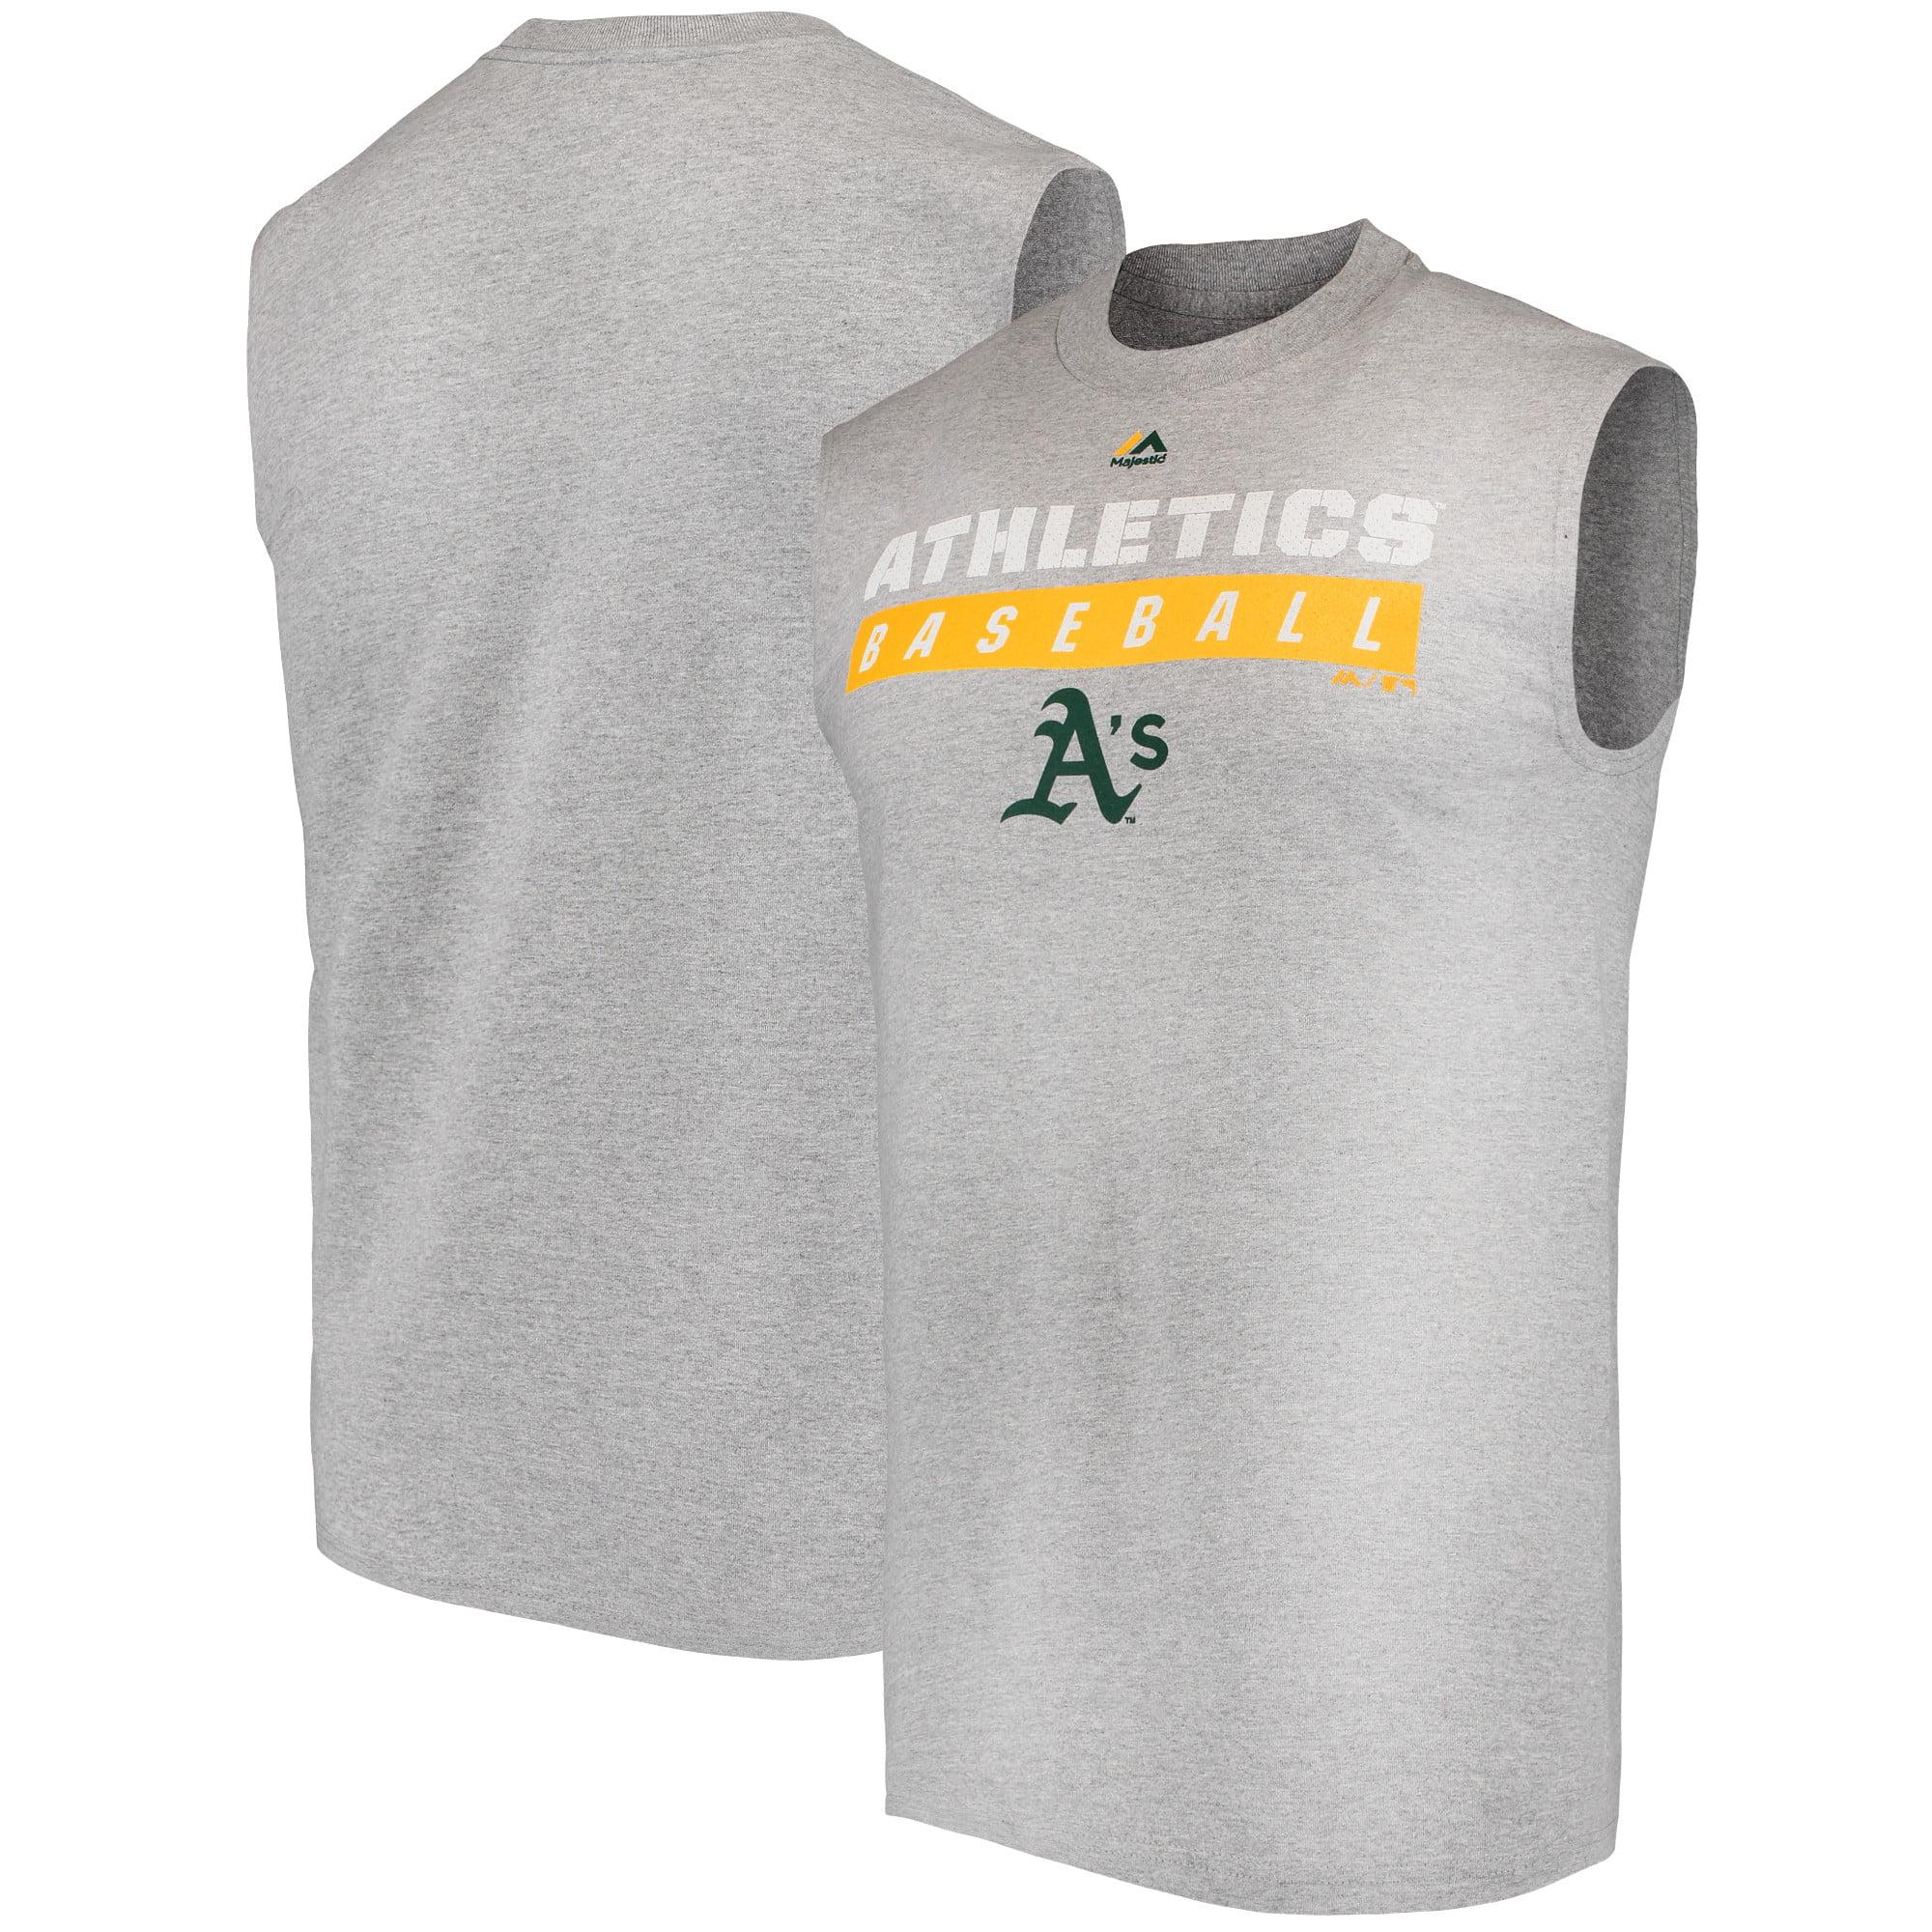 Oakland Athletics Majestic Proven Pastime Sleeveless T-Shirt - Gray